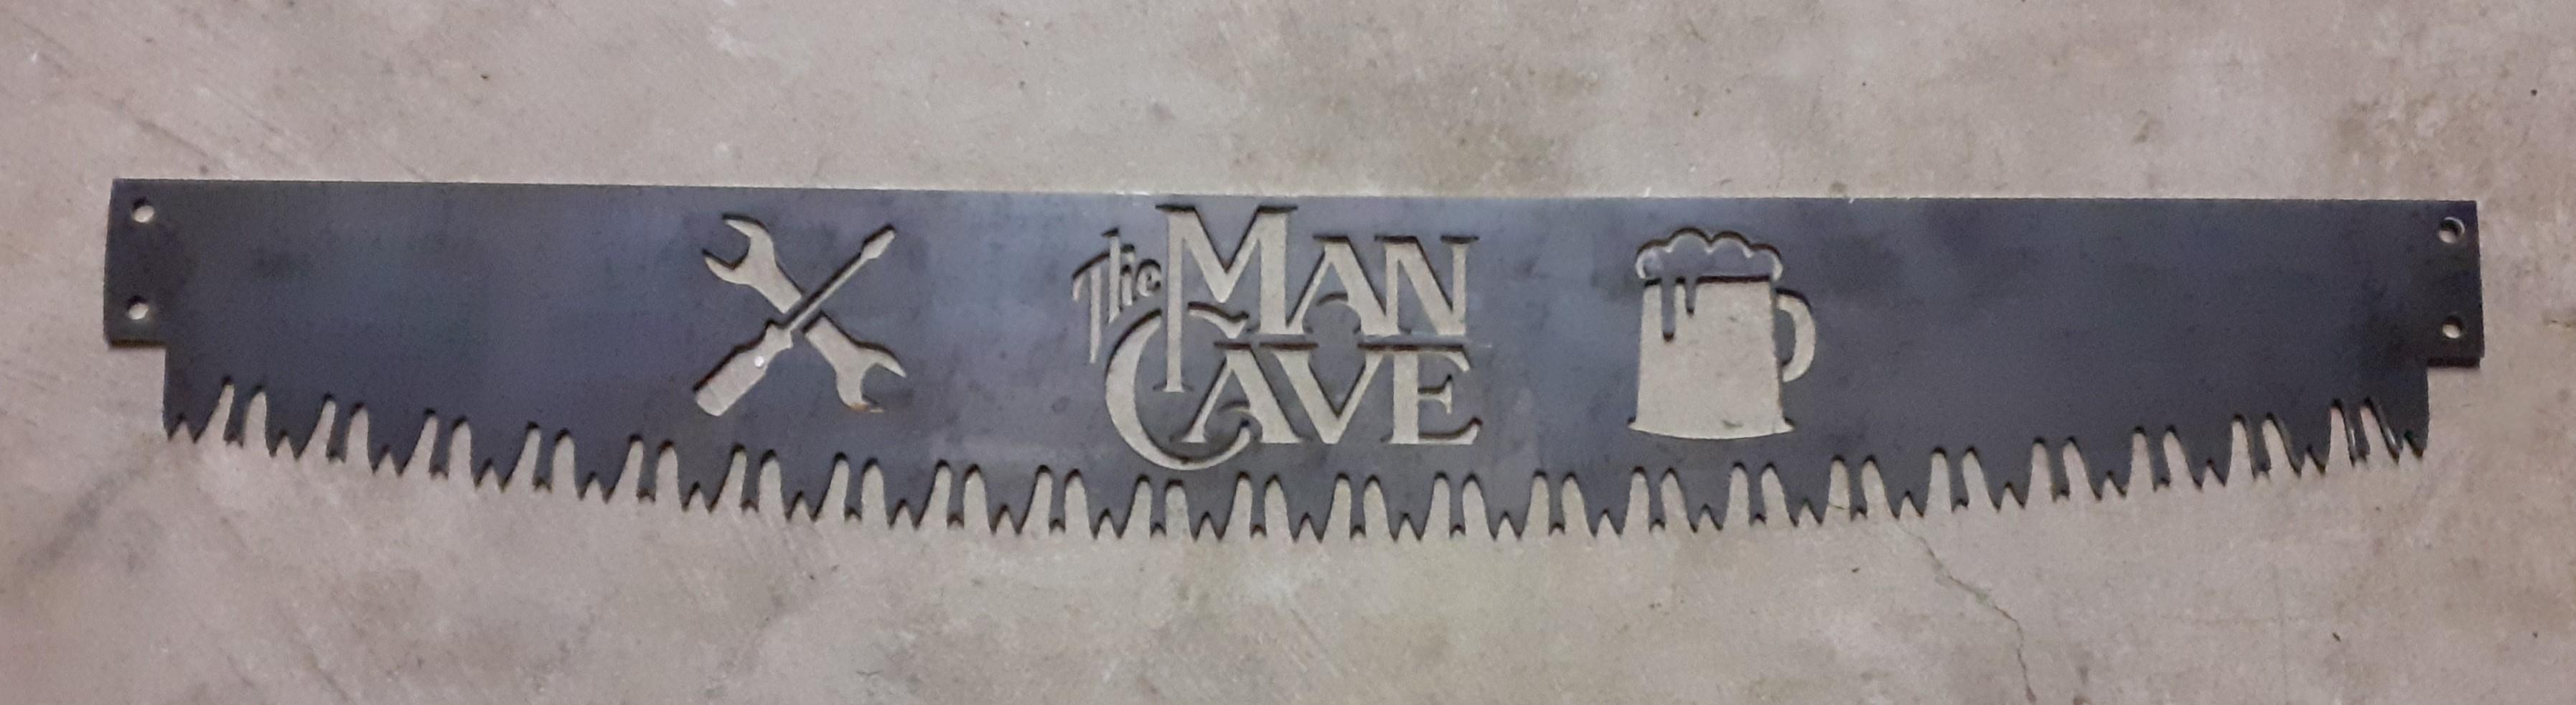 Man Cave Saw